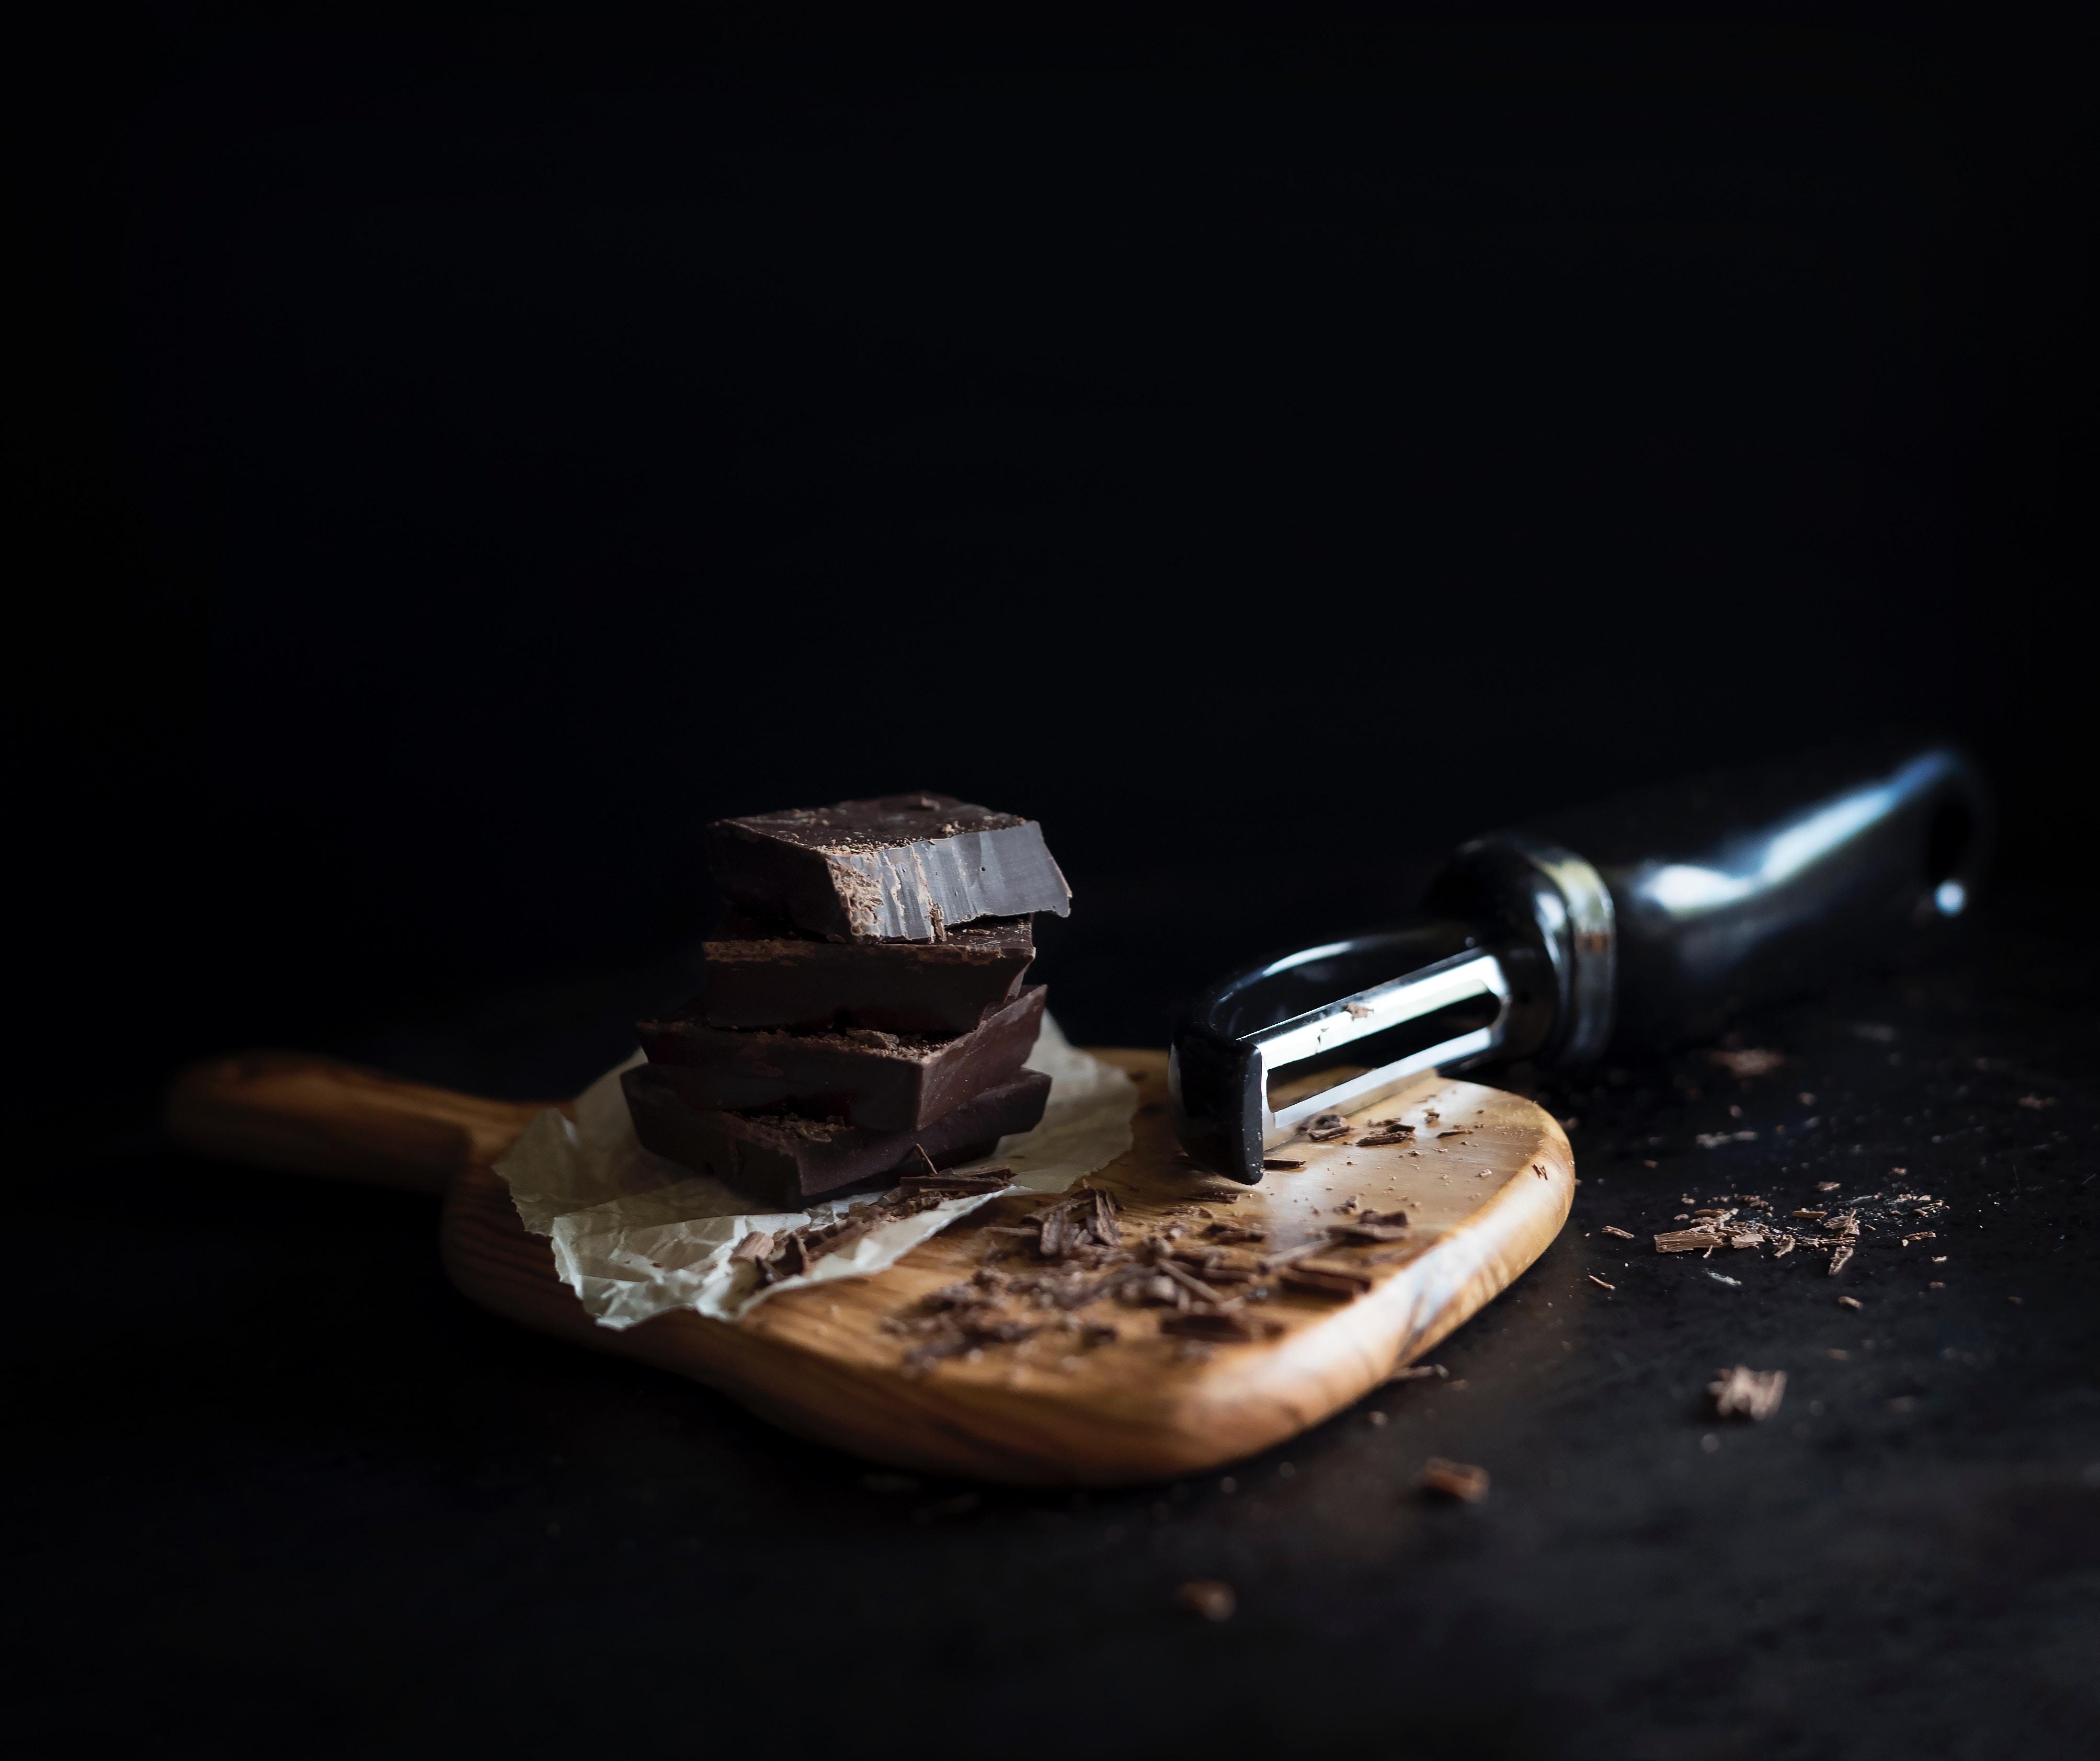 Chocolat©Krista McPhee on Unsplash